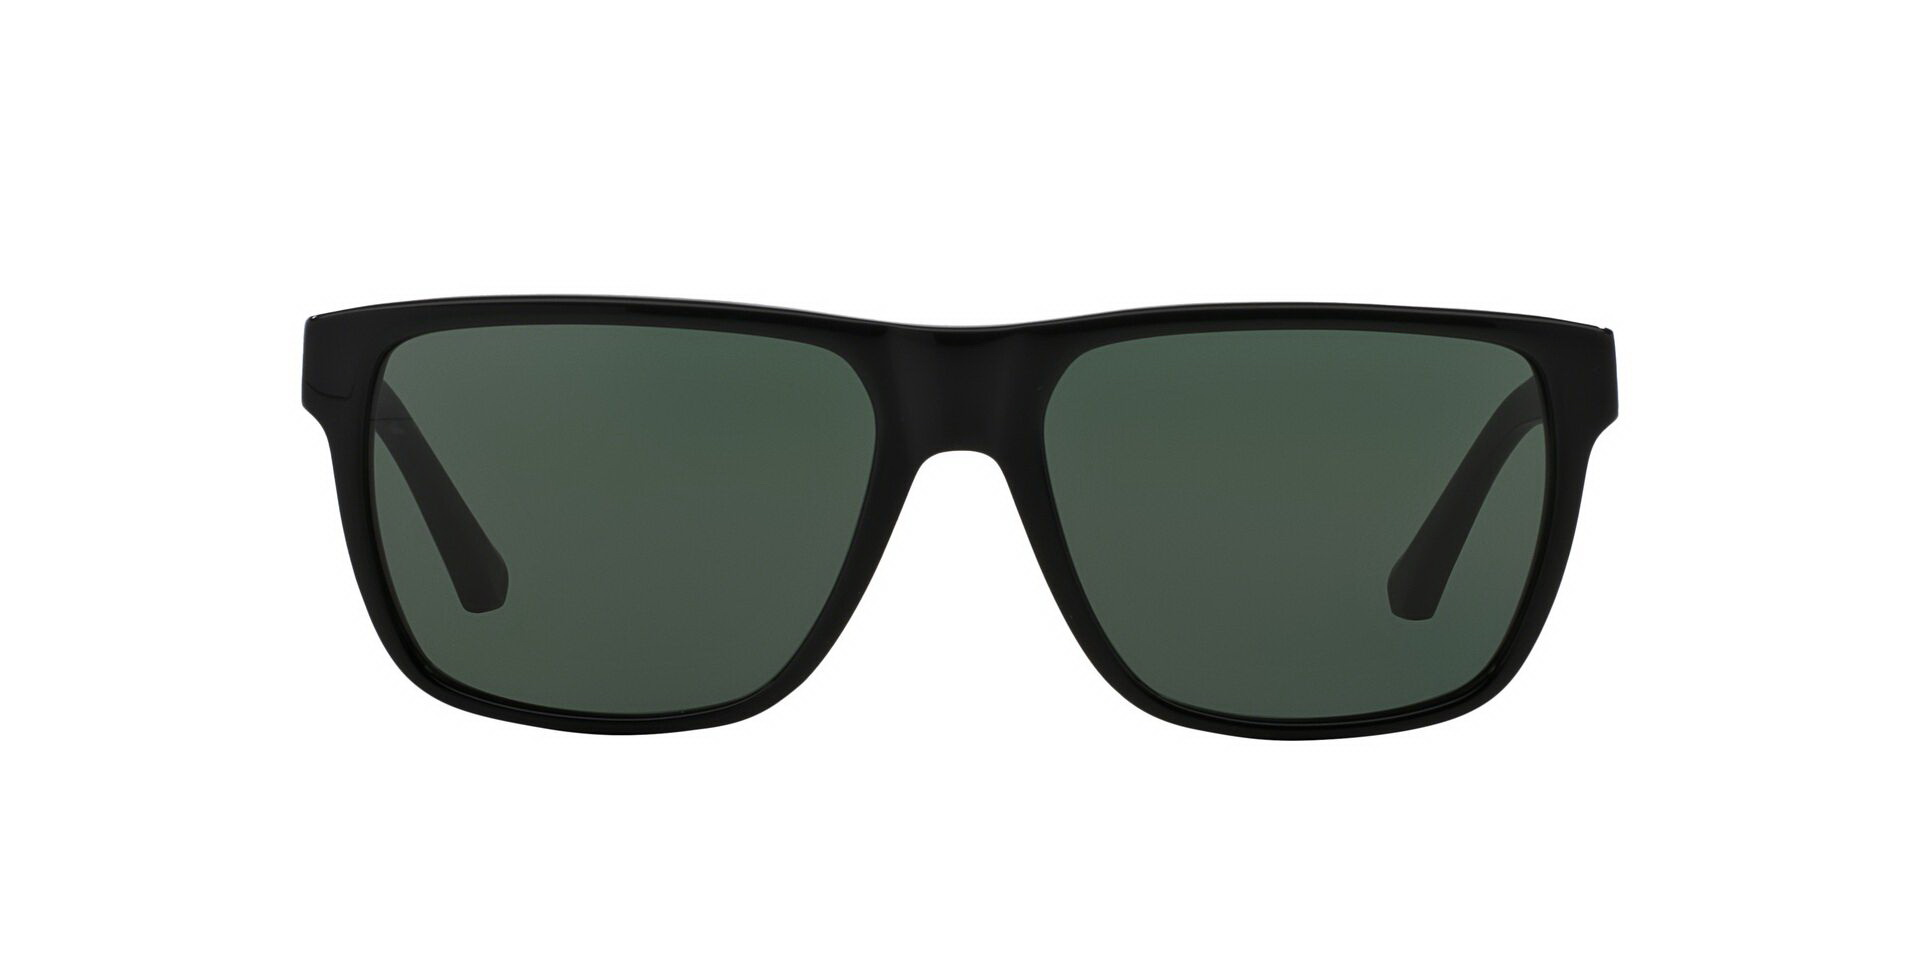 Солнцезащитные очки Очки с/з Emporio Armani 0EA4035 501771